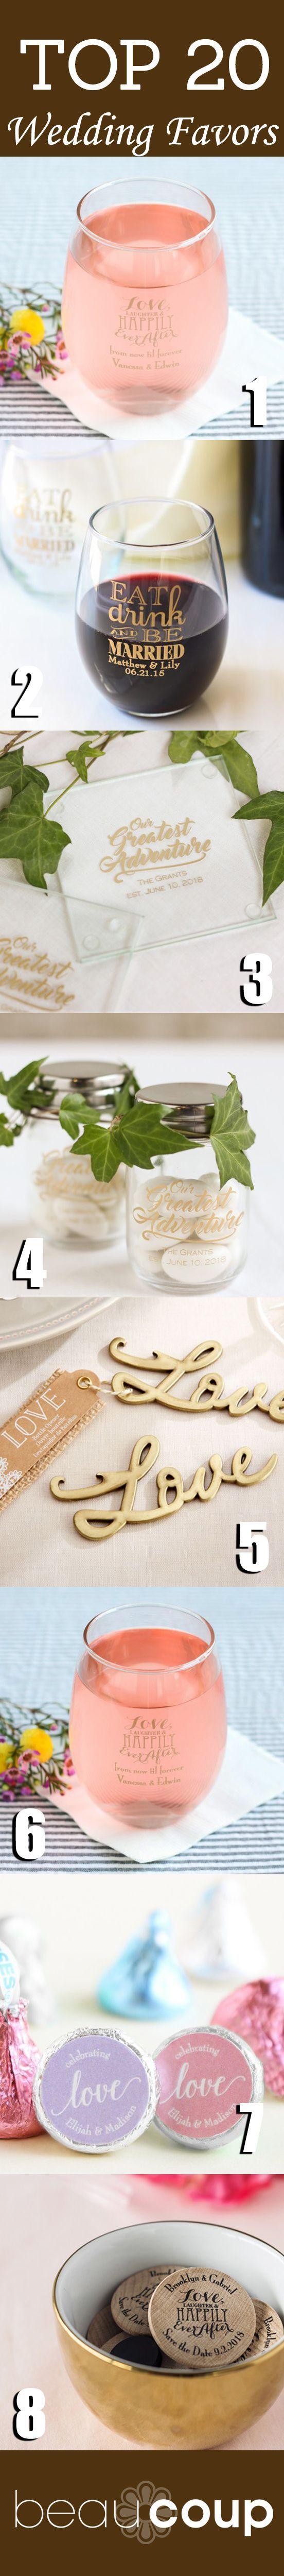 Beau Coup Wedding Favors | Giftwedding.co